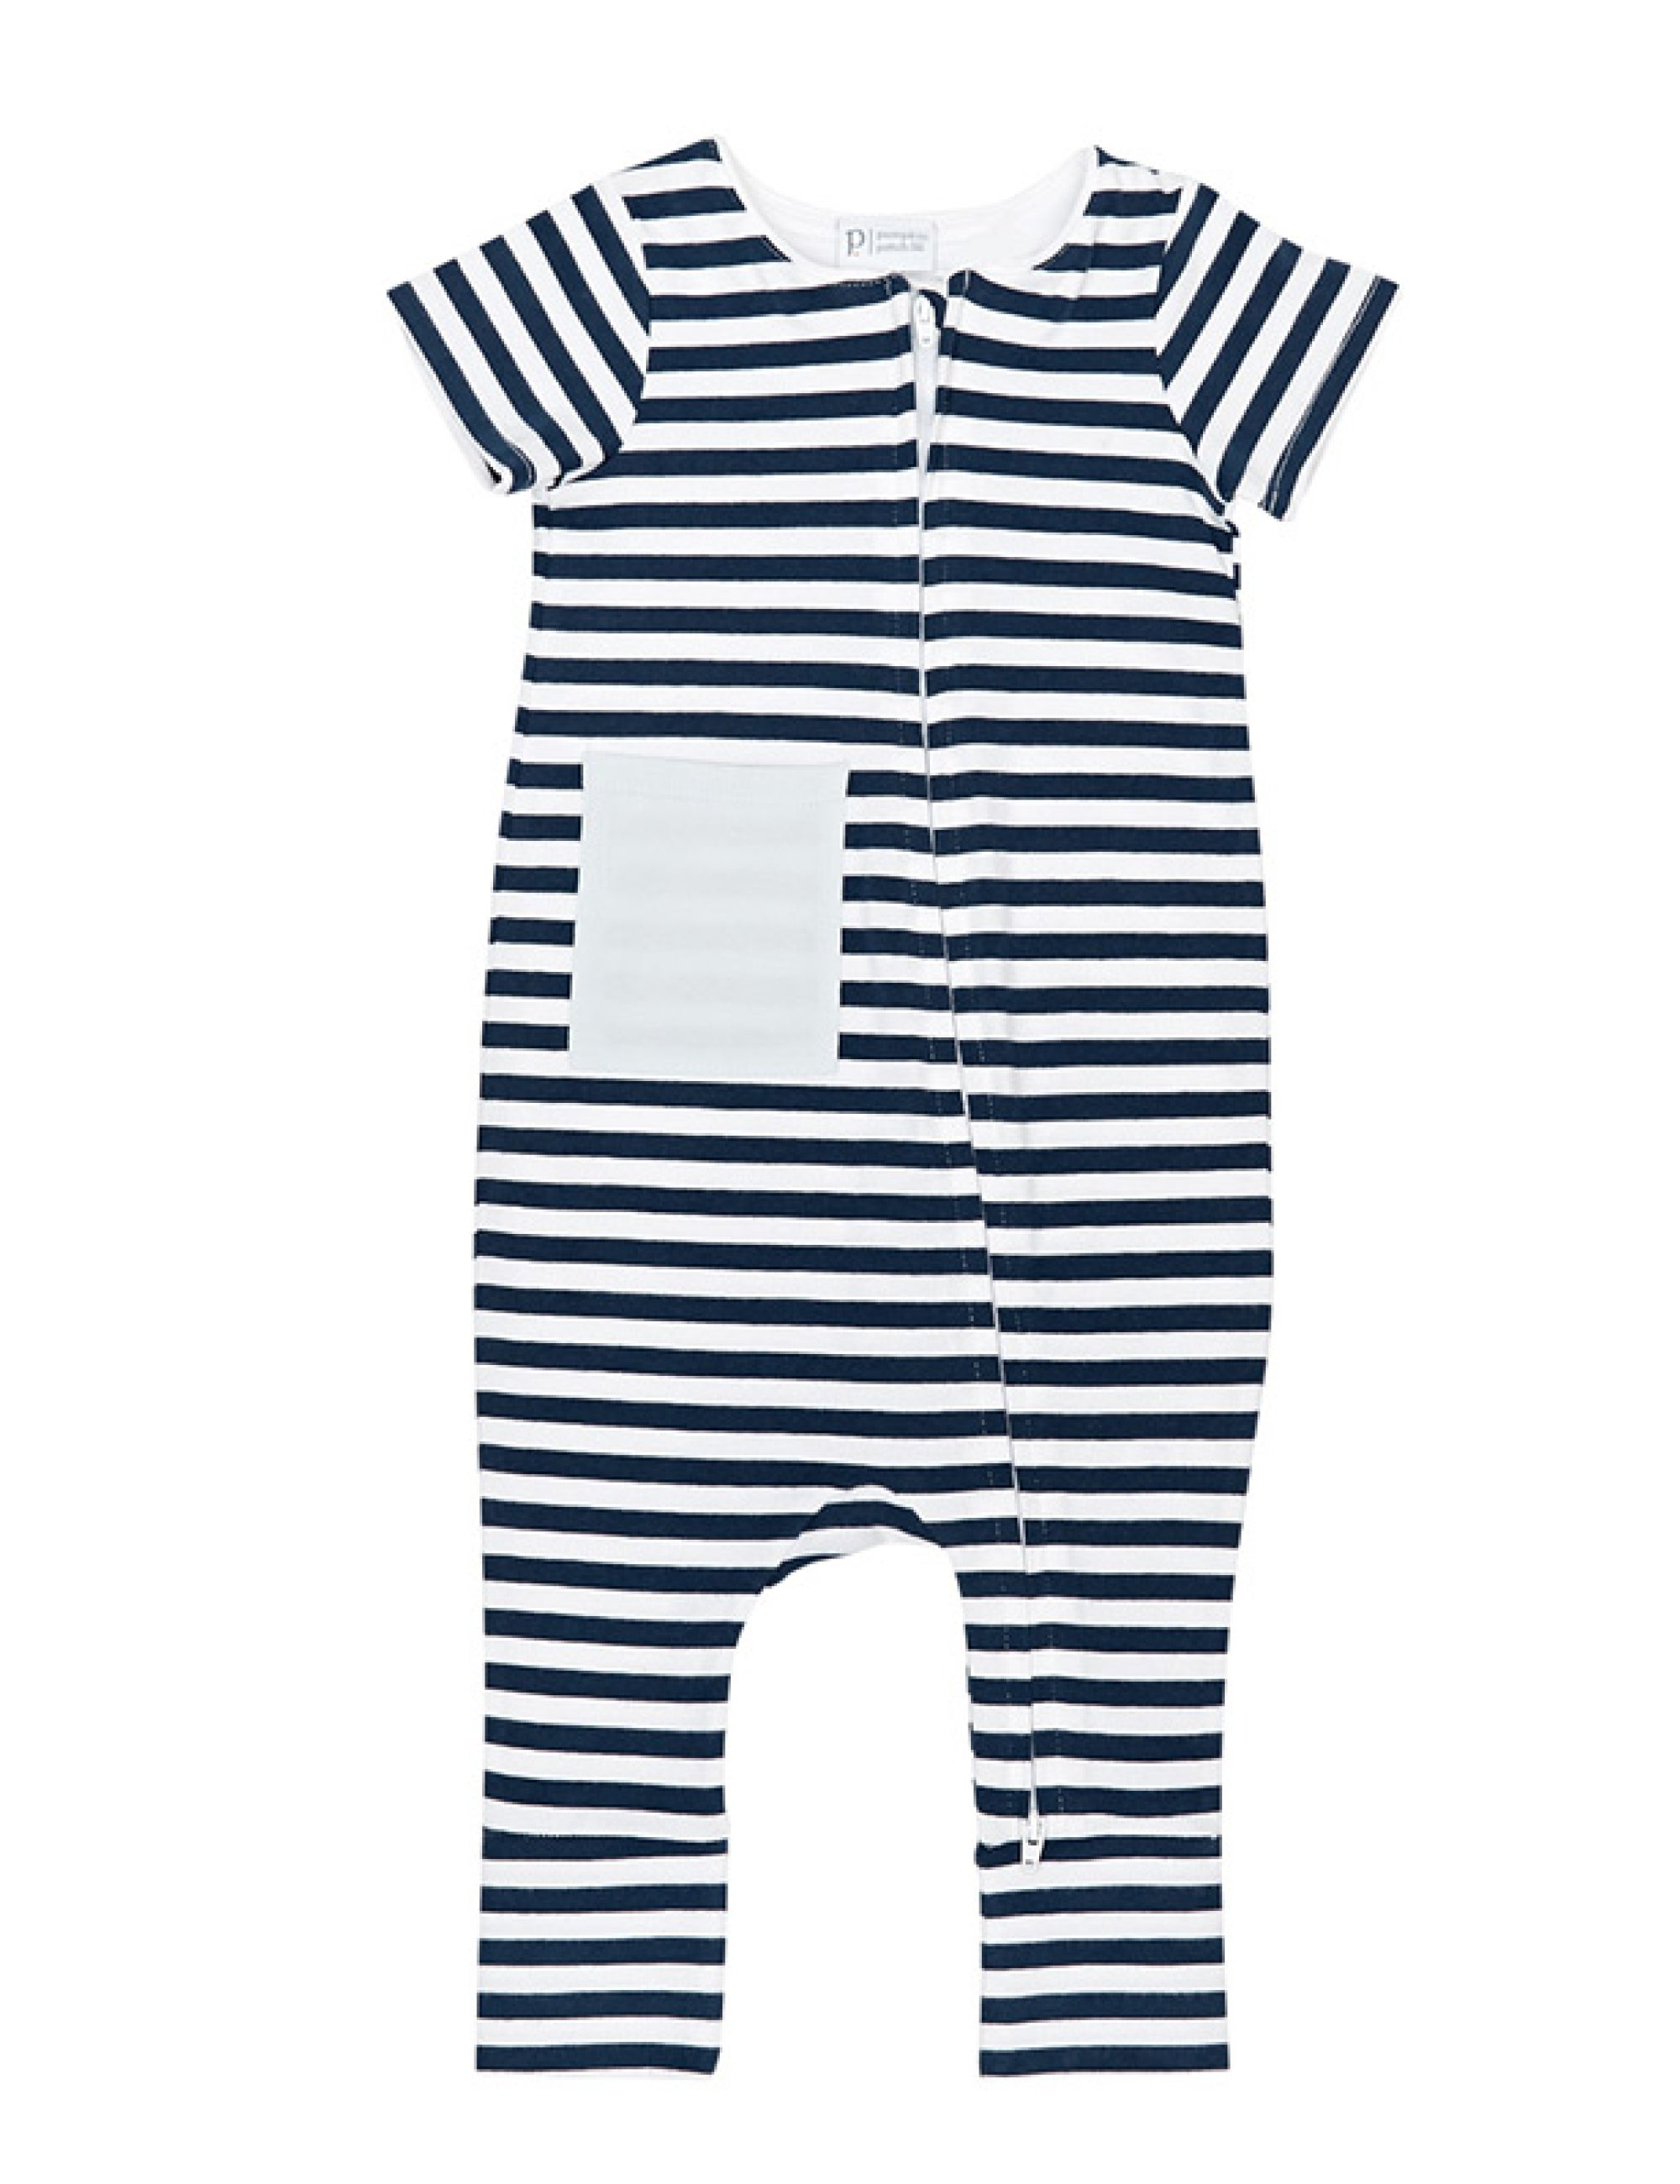 Unisex Baby Short Sleeve Jumpsuit Nature Peace Sign Toddler Jumpsuit